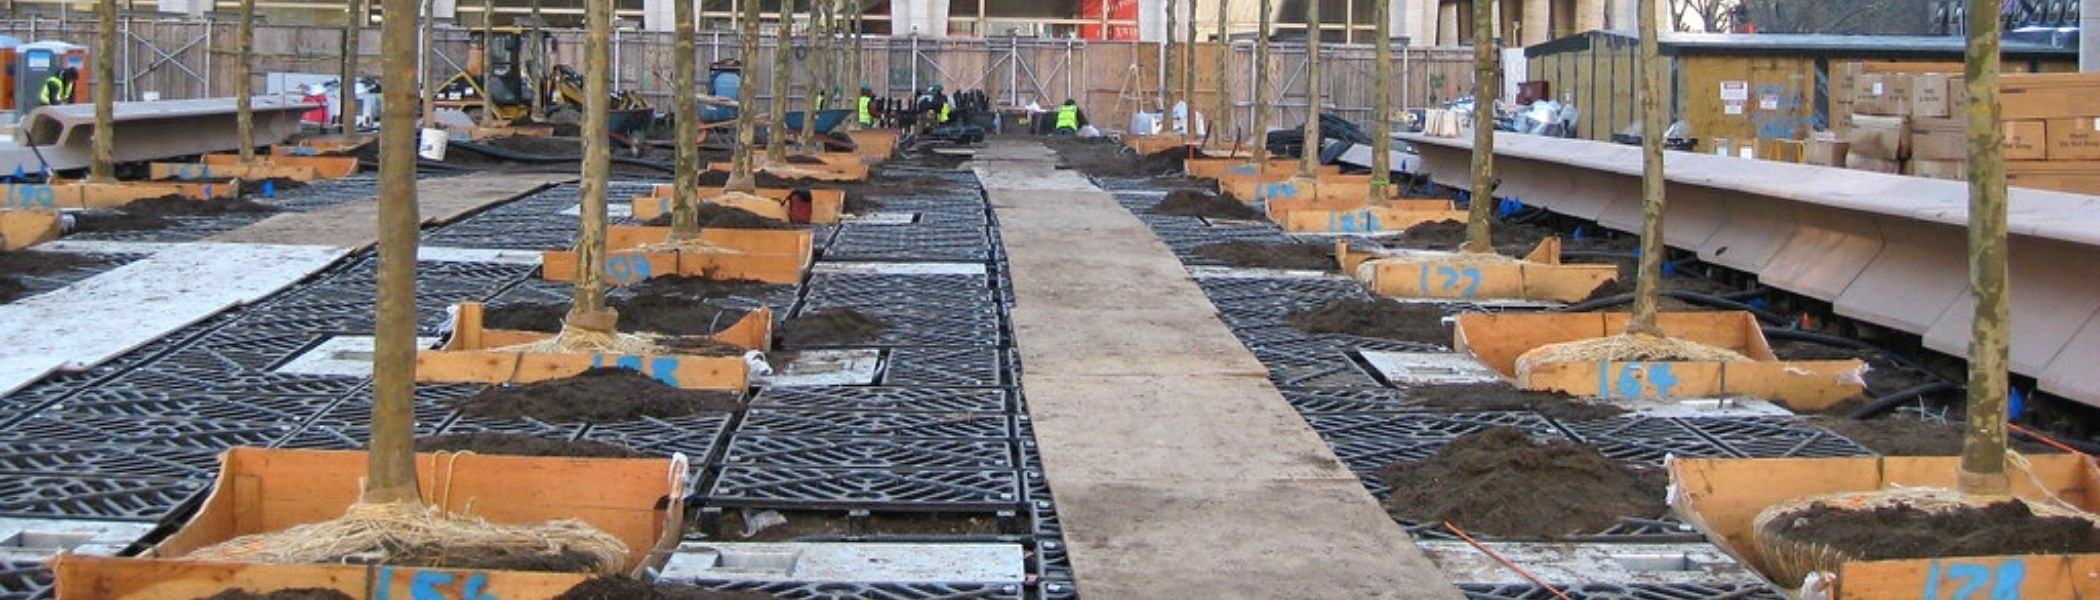 silva cells complete landscaping service